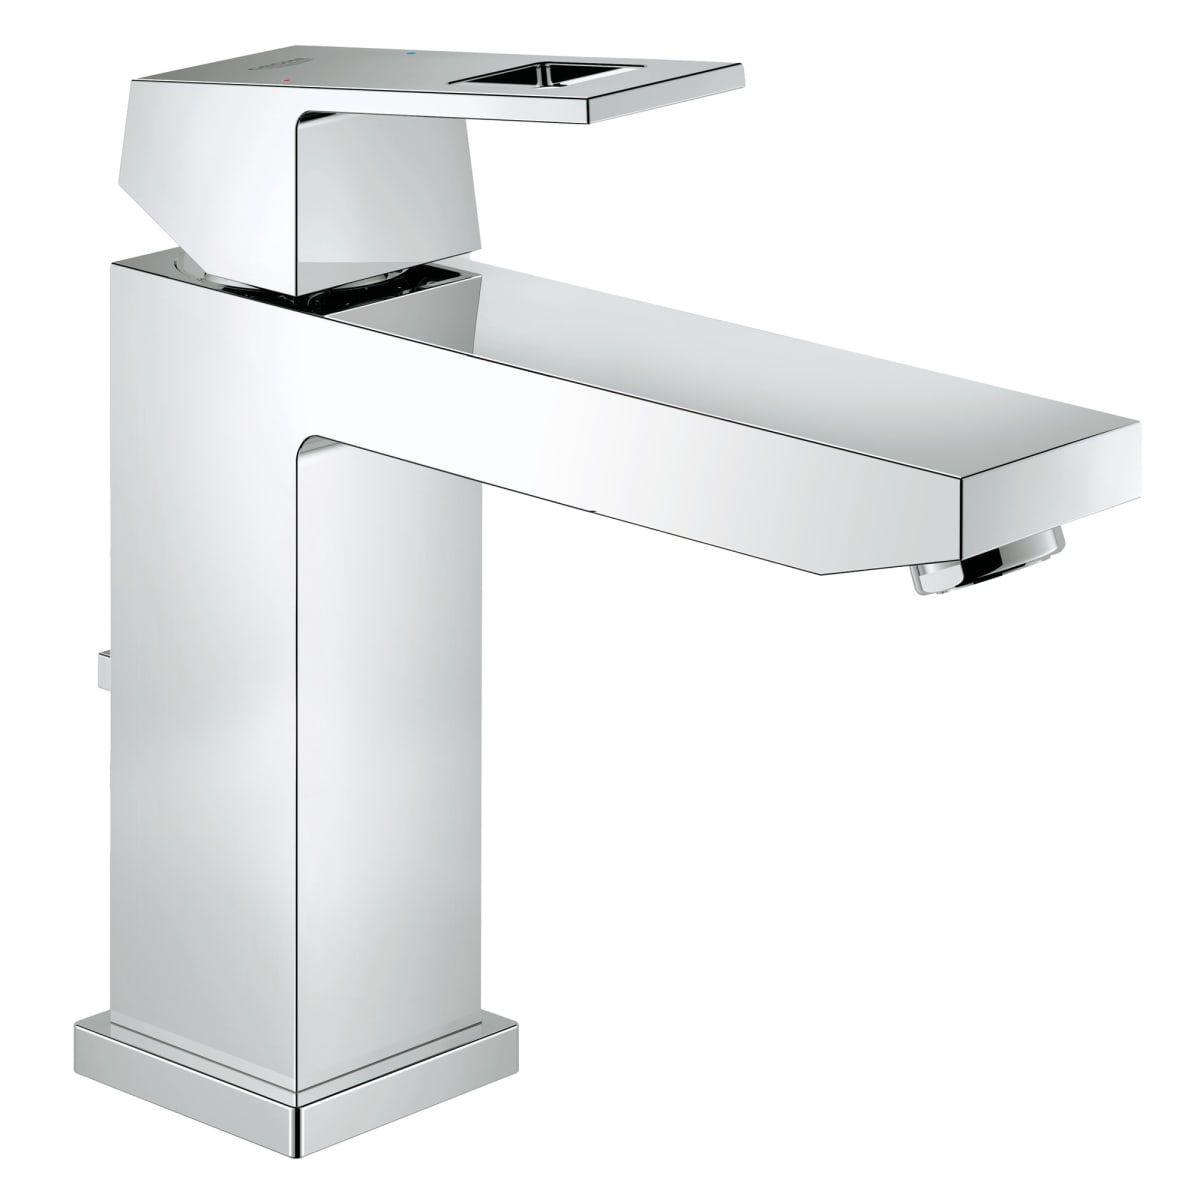 Grohe 23670000 Eurocube 1 2 Gpm Deck Mounted Build Com Bathroom Faucets Sink Faucets Bathroom Sink Faucets Single Hole [ 1200 x 1200 Pixel ]